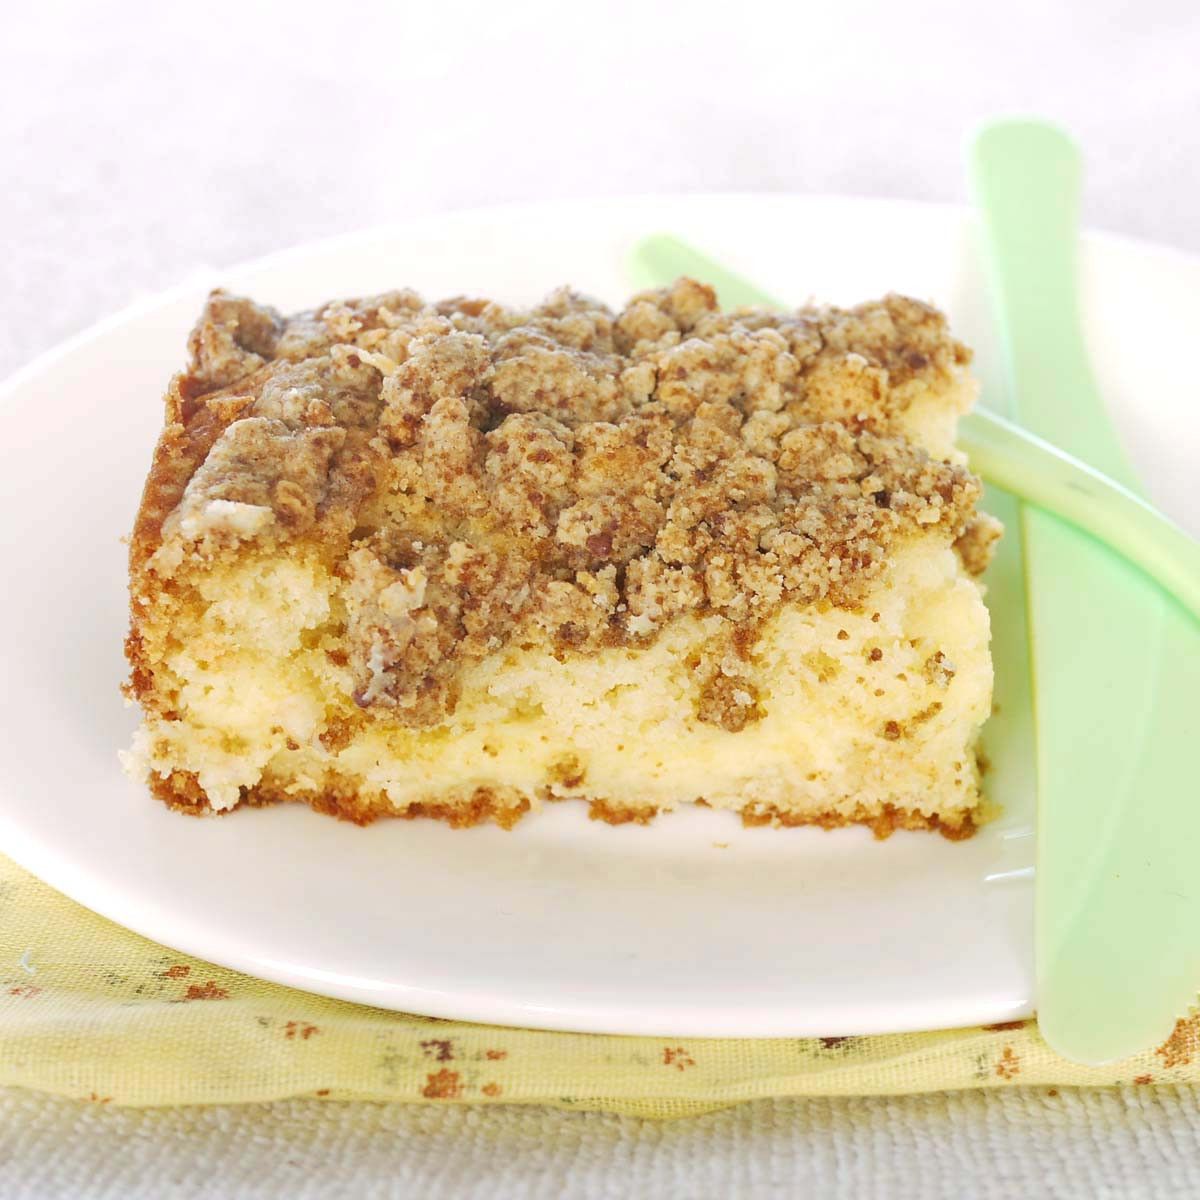 Cheesecake Filling Recipe  Coffee Crumb Cake with Lemon Cheesecake Filling